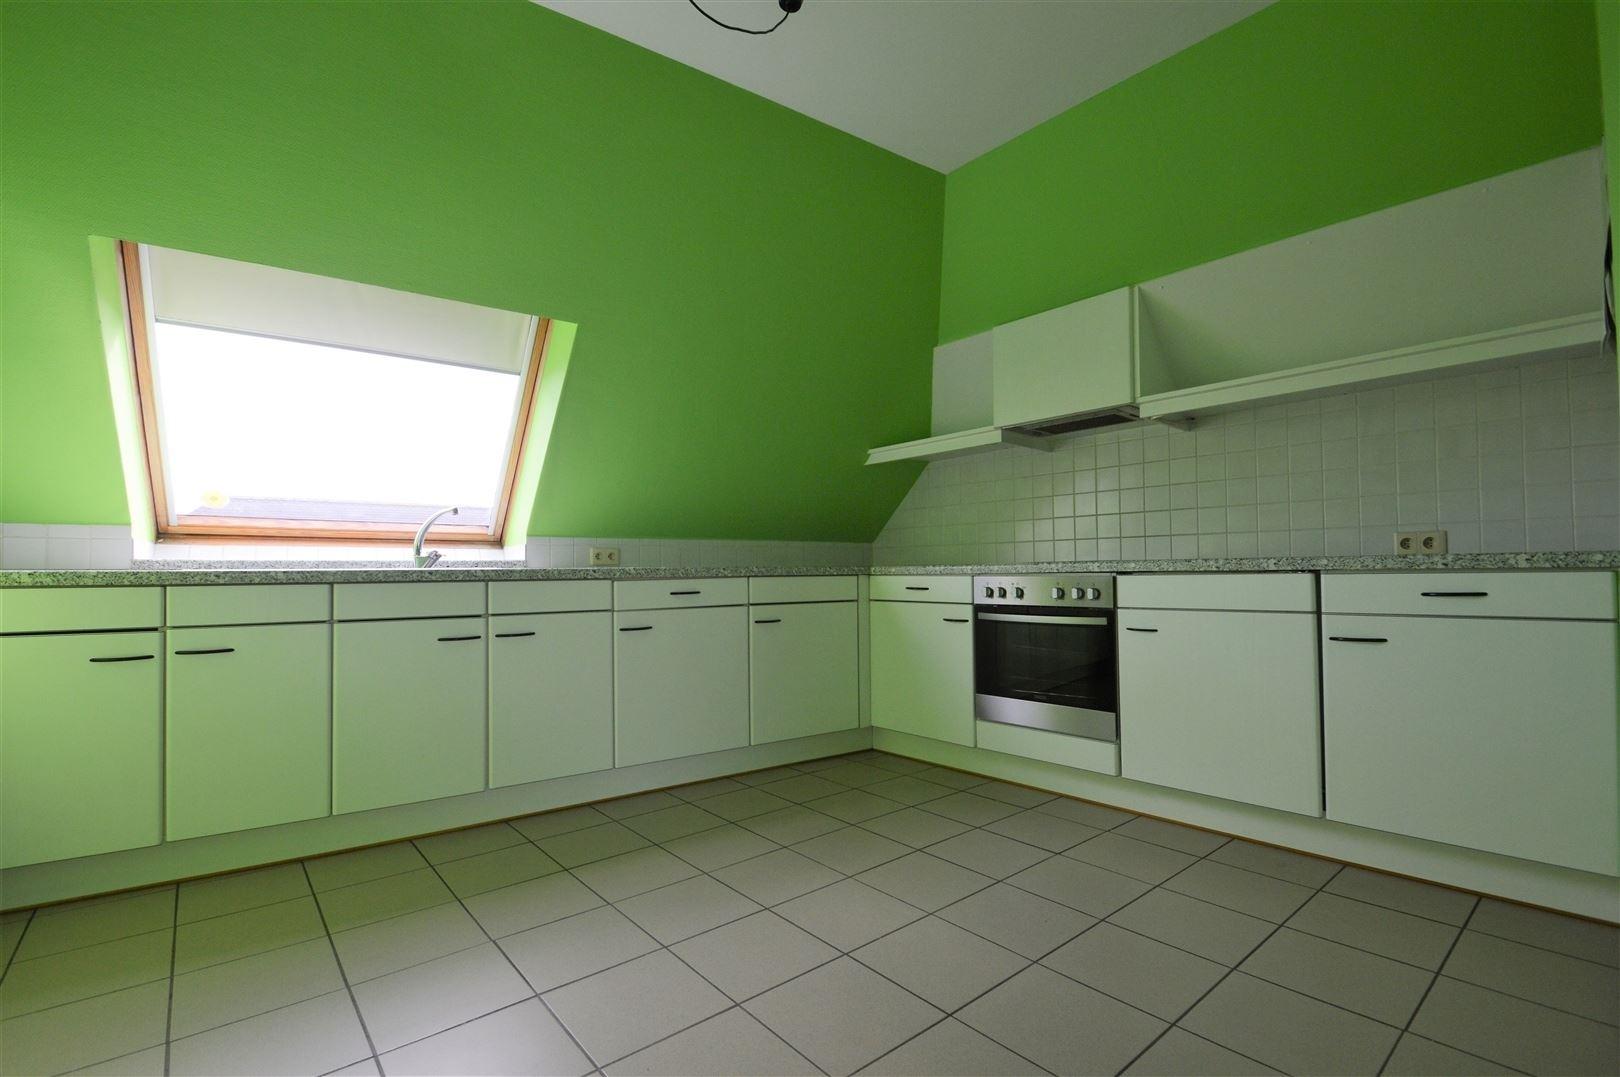 Foto 5 : Appartement te 9280 LEBBEKE (België) - Prijs € 645